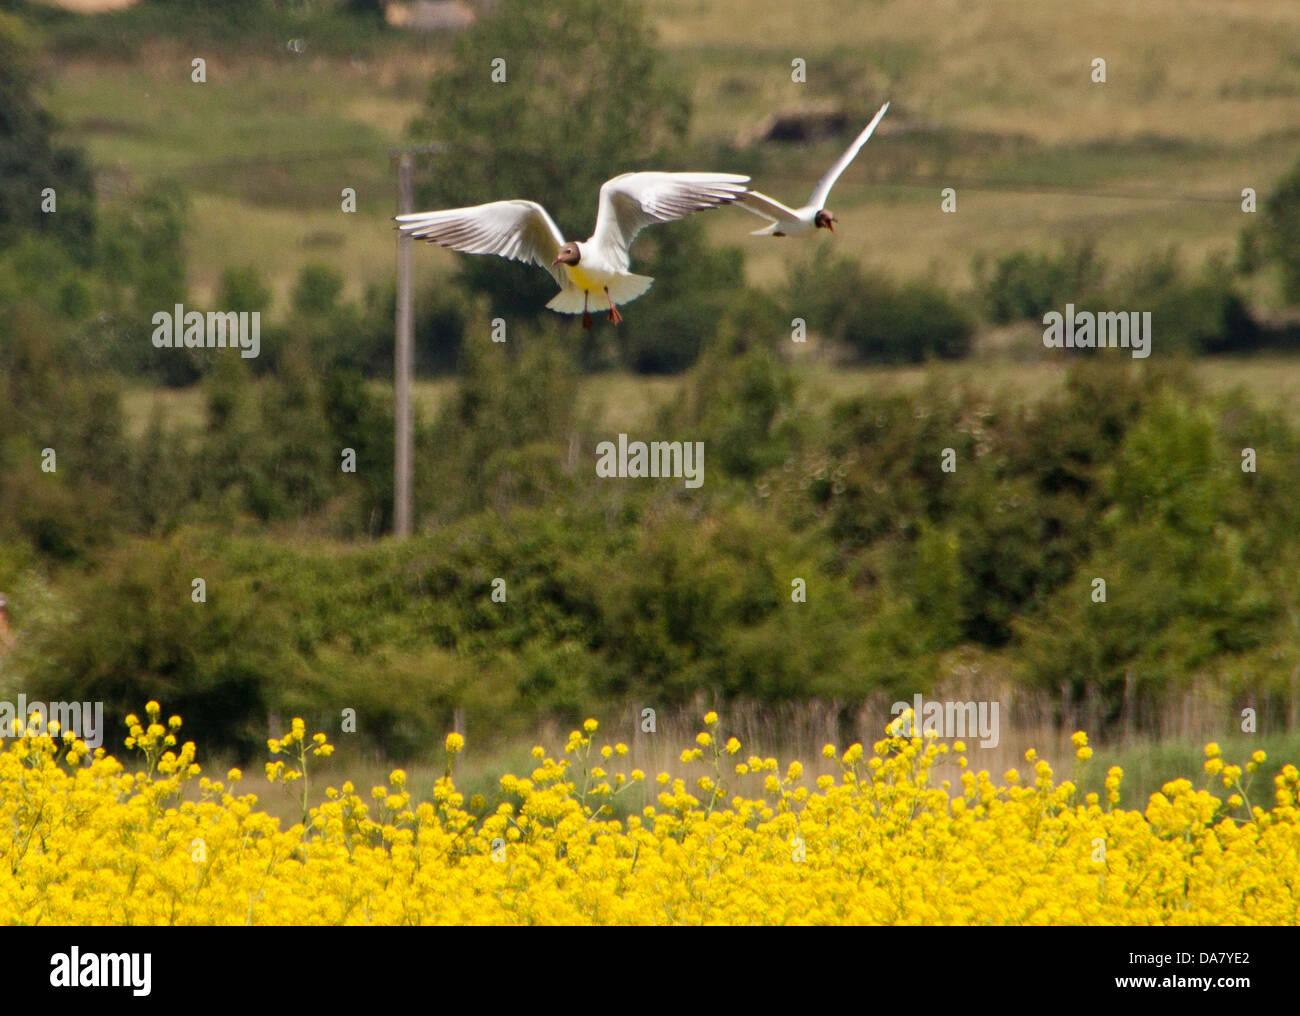 Black-Headed Gull - Larus ridibundus coming into land amongst the rapeseed, Stock Photo